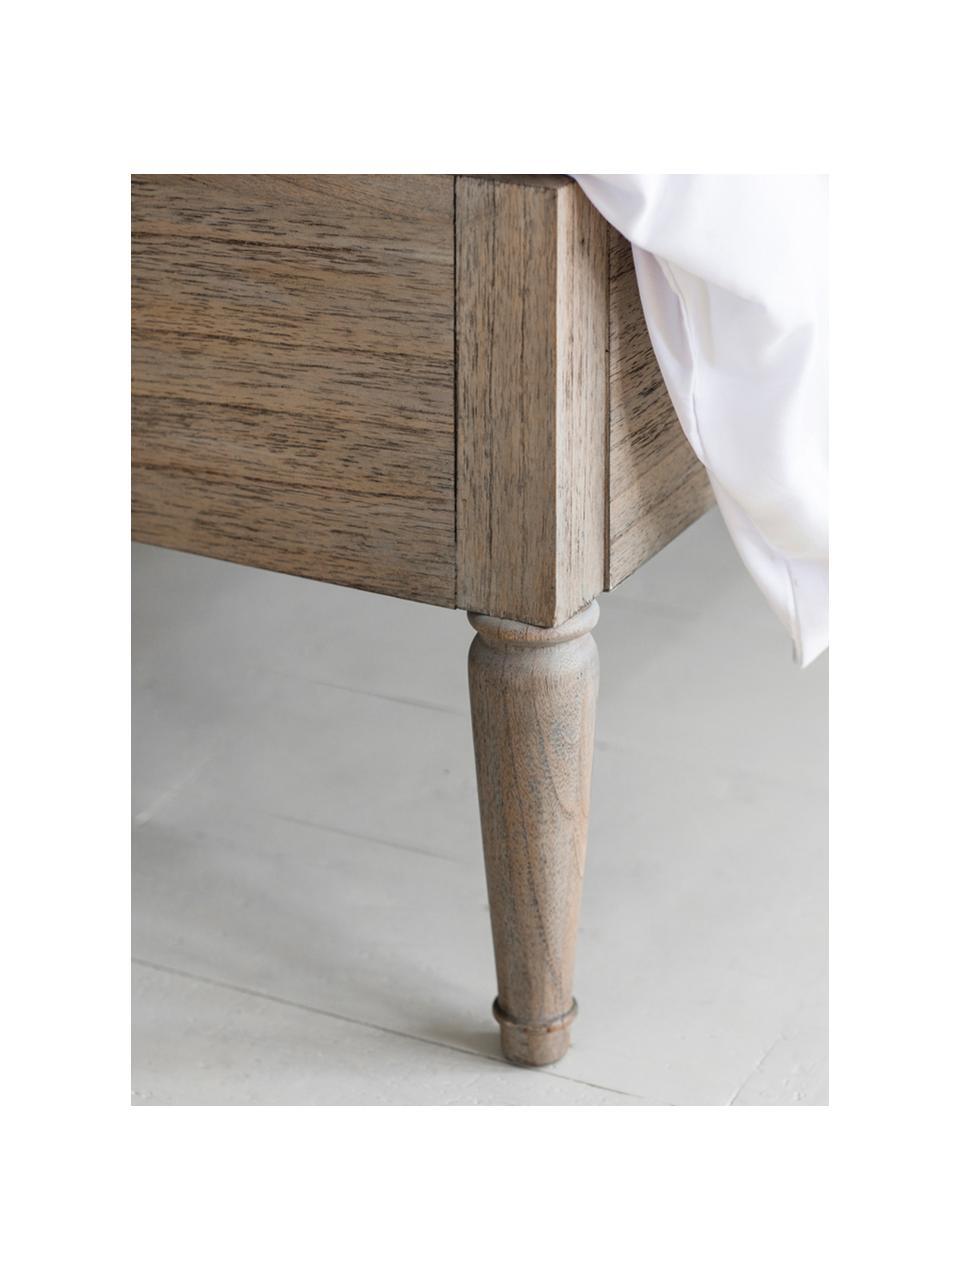 Holzbett Mustique mit verziertem Kopfteil, Korpus: Eschenholz, Eschenholz, 180 x 200 cm